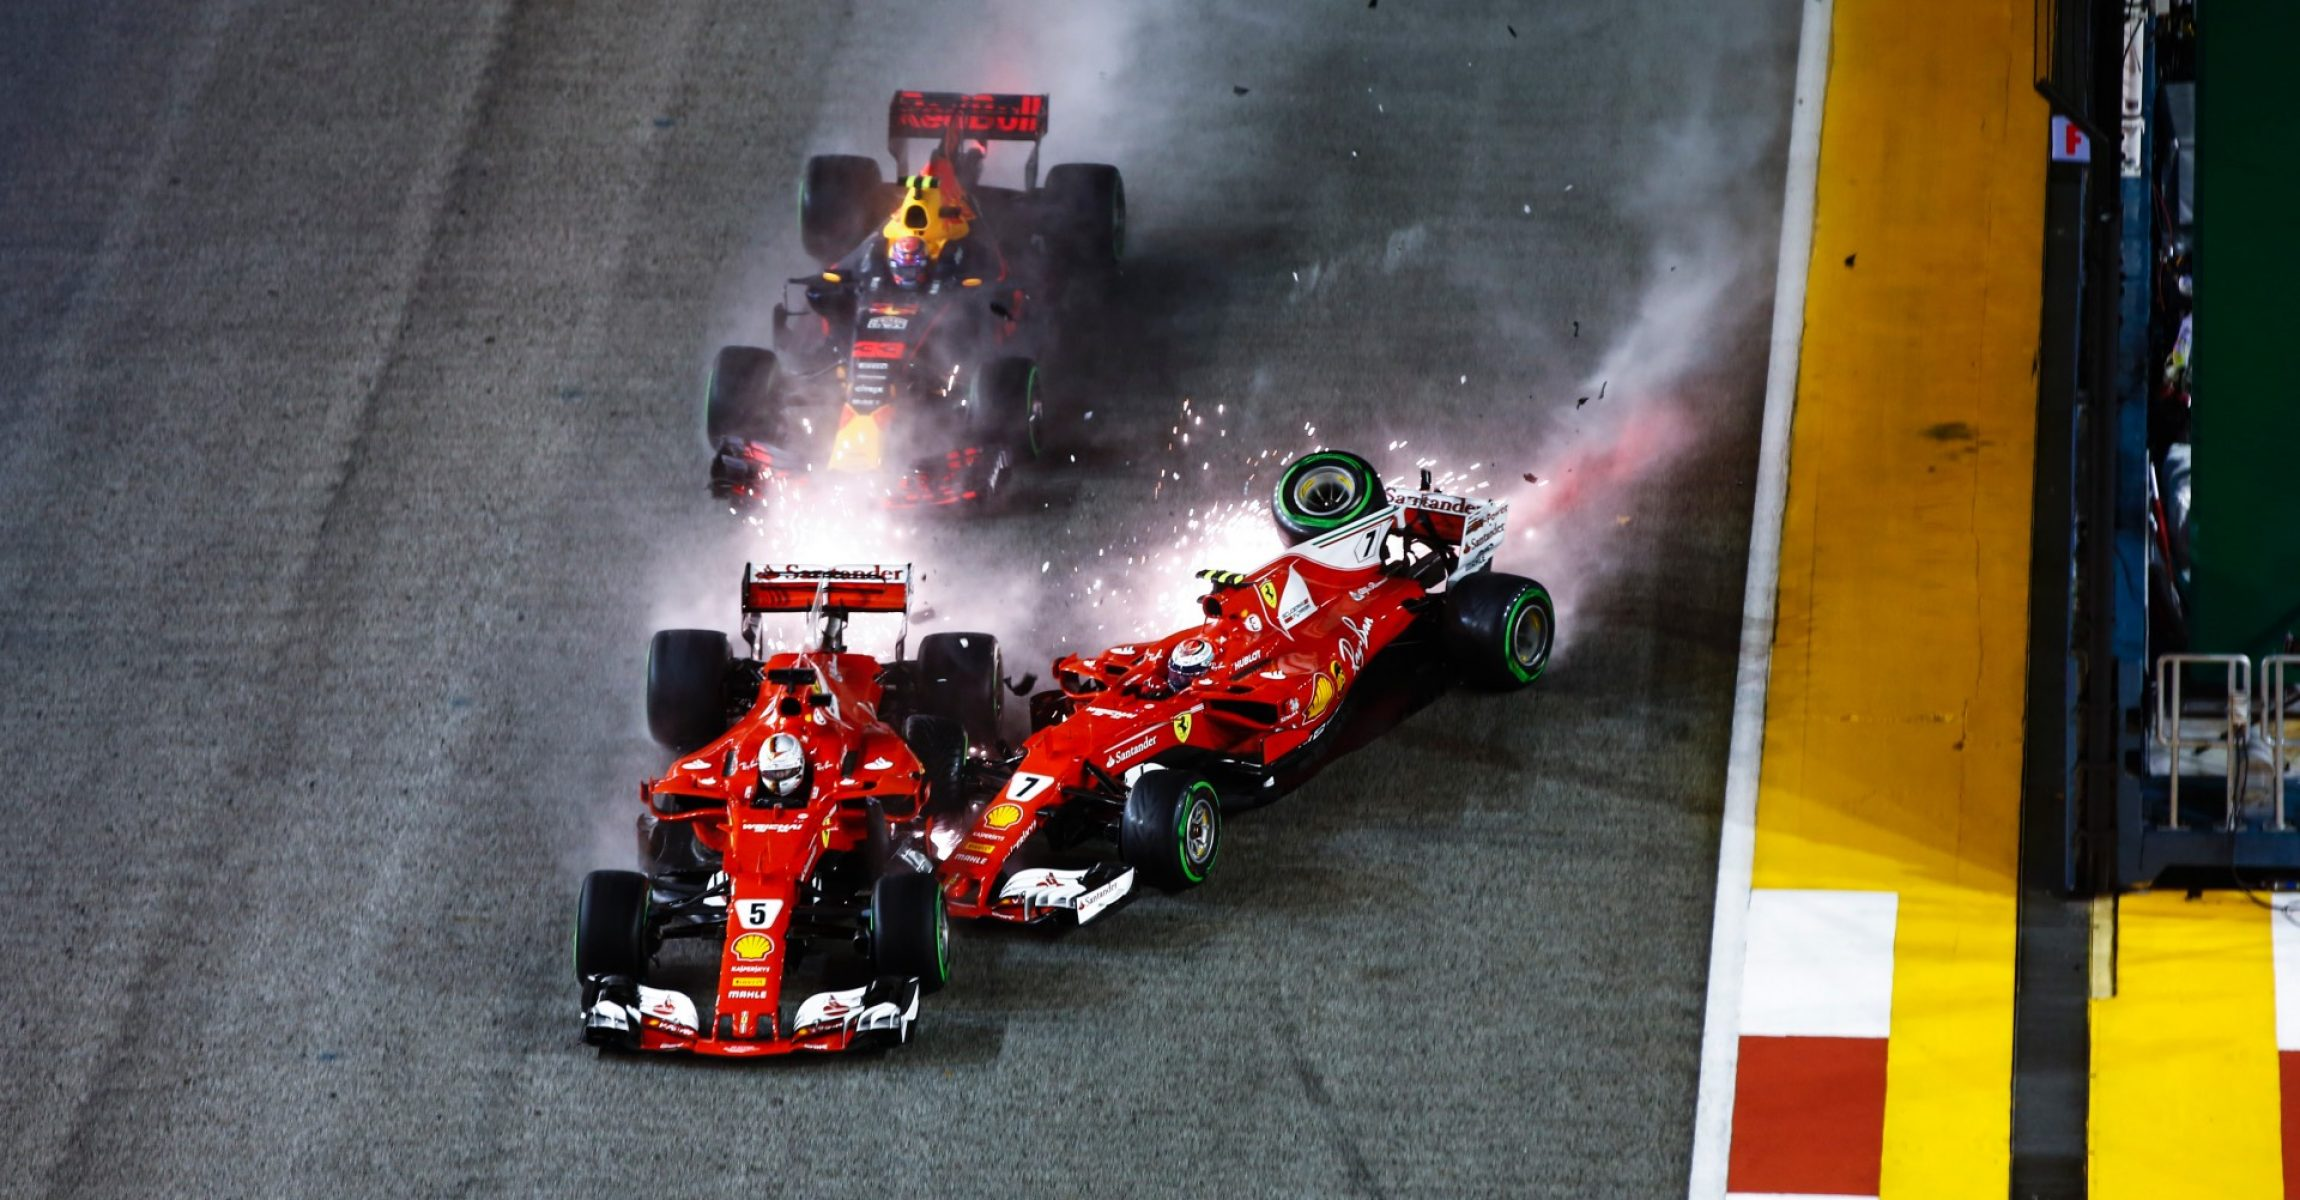 Sebastian Vettel (GER) Ferrari SF70-H, Max Verstappen (NED) Red Bull Racing RB13 and Kimi Raikkonen (FIN) Ferrari SF70-H crash at the start of the race at Formula One World Championship, Rd14, Singapore Grand Prix, Race, Marina Bay Street Circuit, Singapore, Sunday 17 September 2017. Räikkönen crash